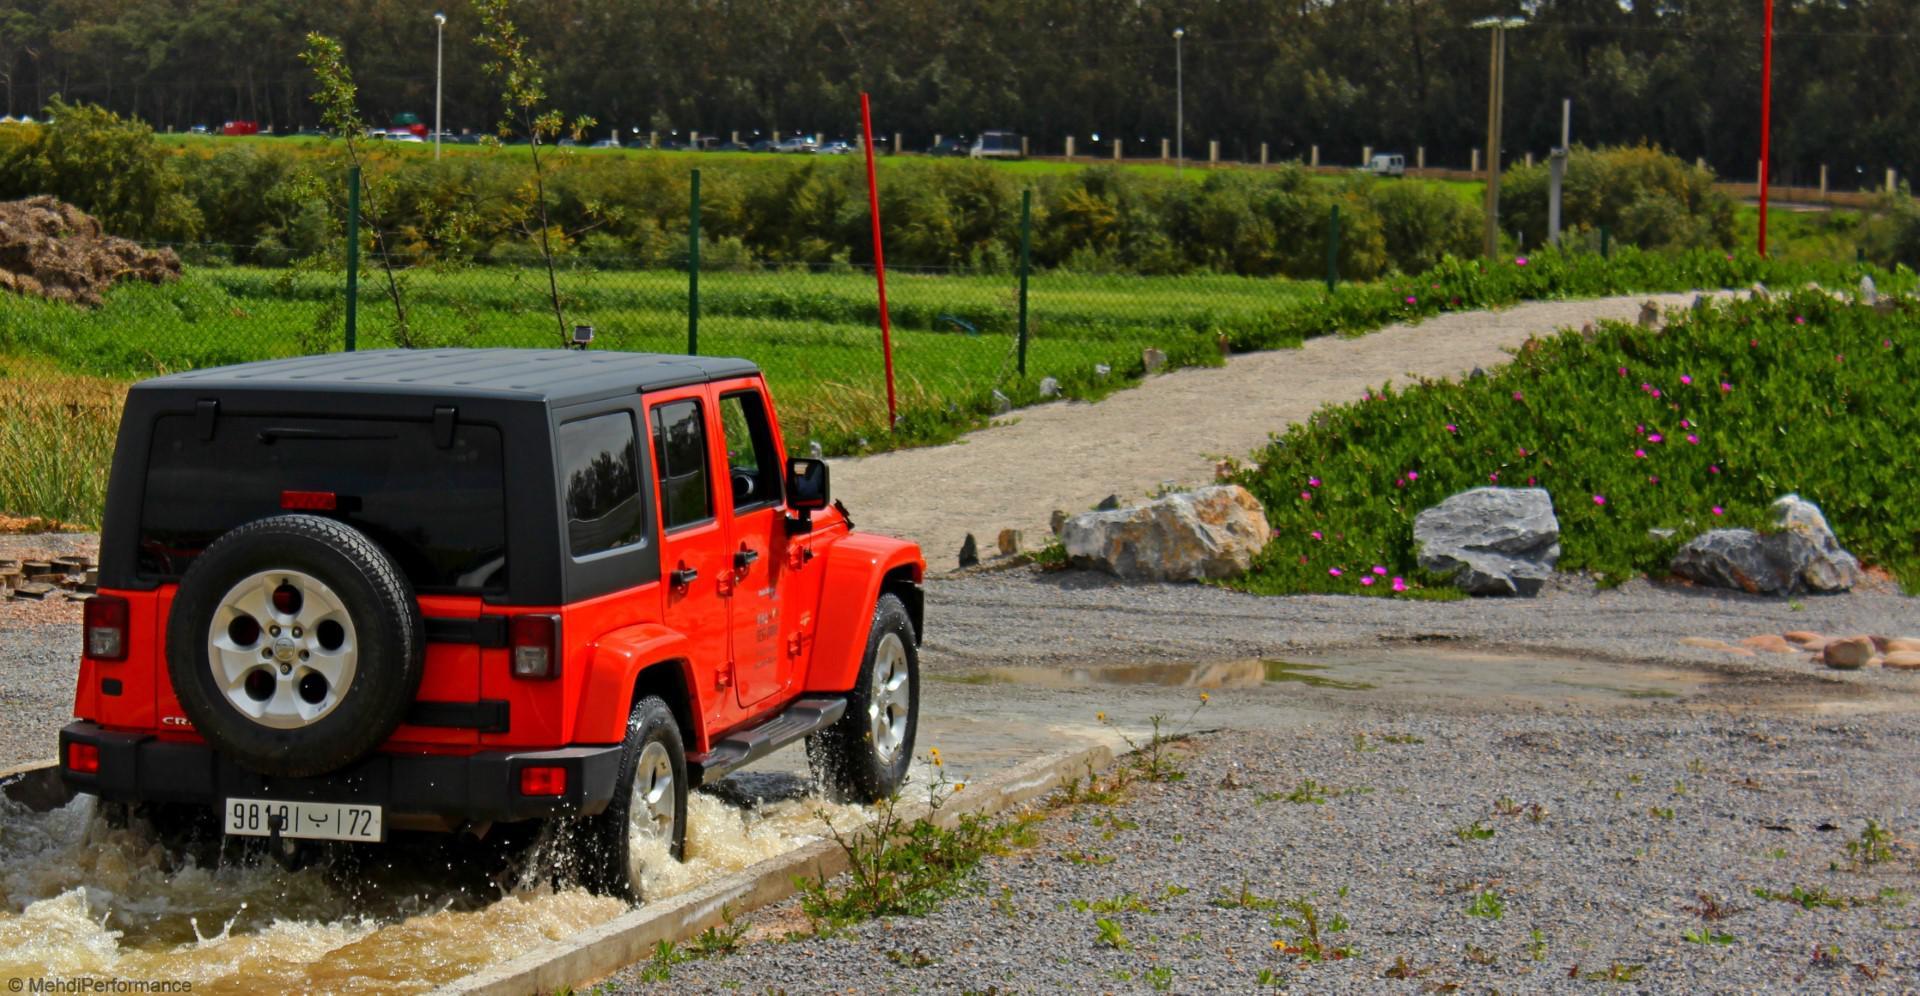 jeep-territory-le-nouveau-terrain-de-jeu-by-motor-village-716-7.jpg